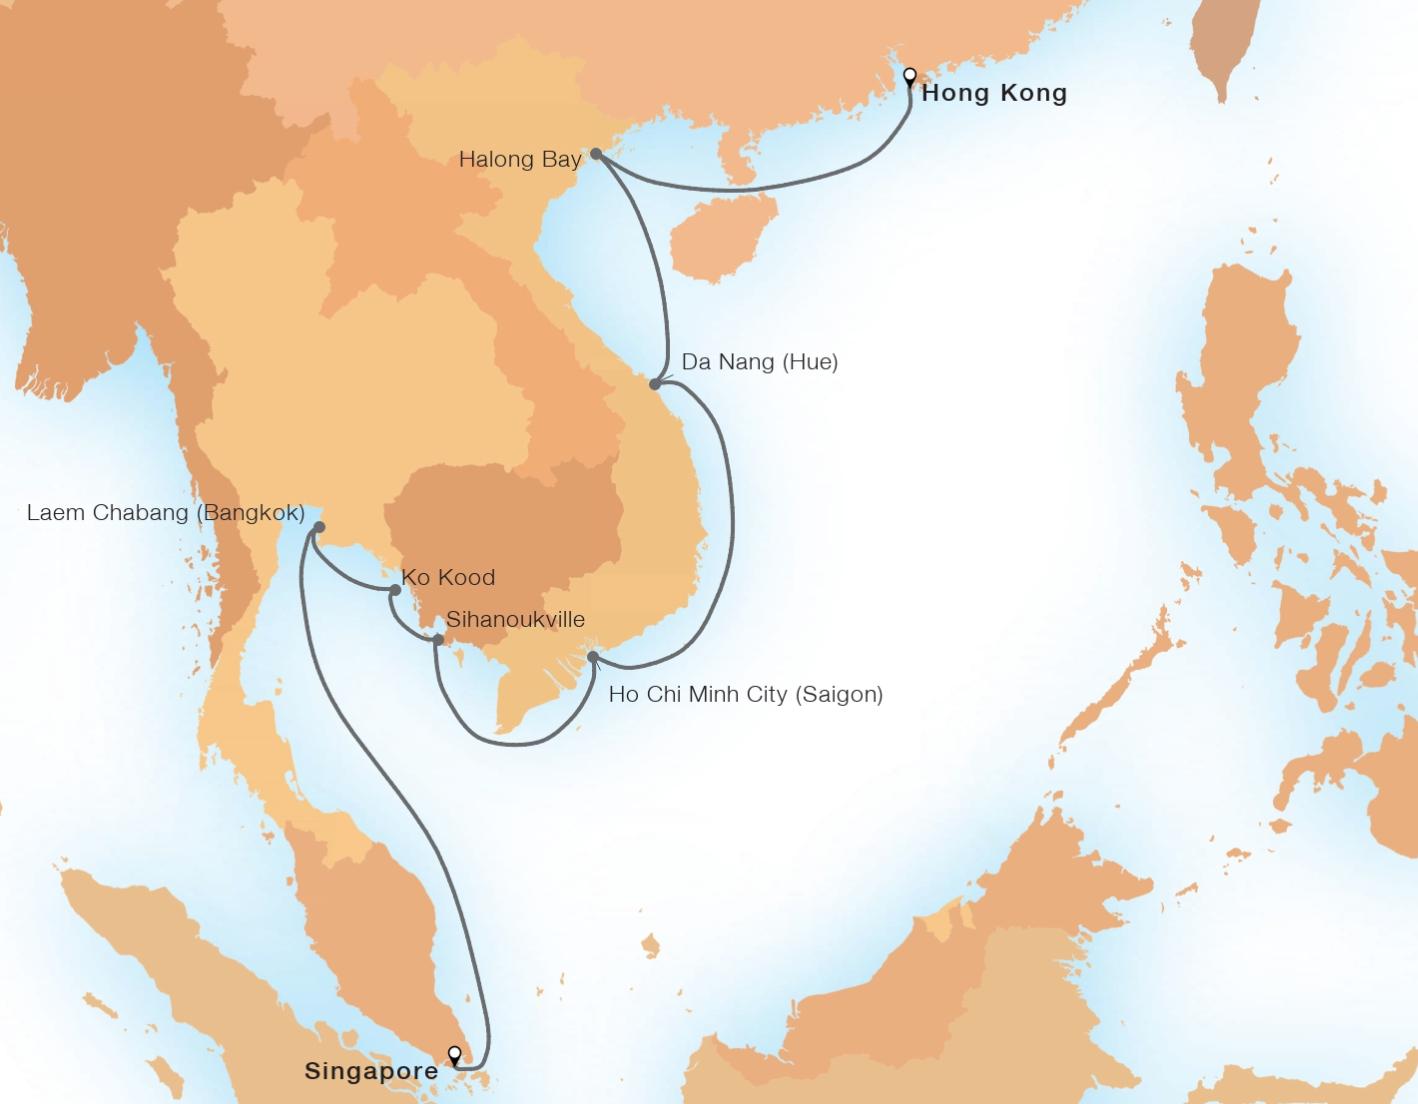 14-Day Holiday Thailand & Vietnam - SEABOURN OVATIONSingapore to Hong Kong, China